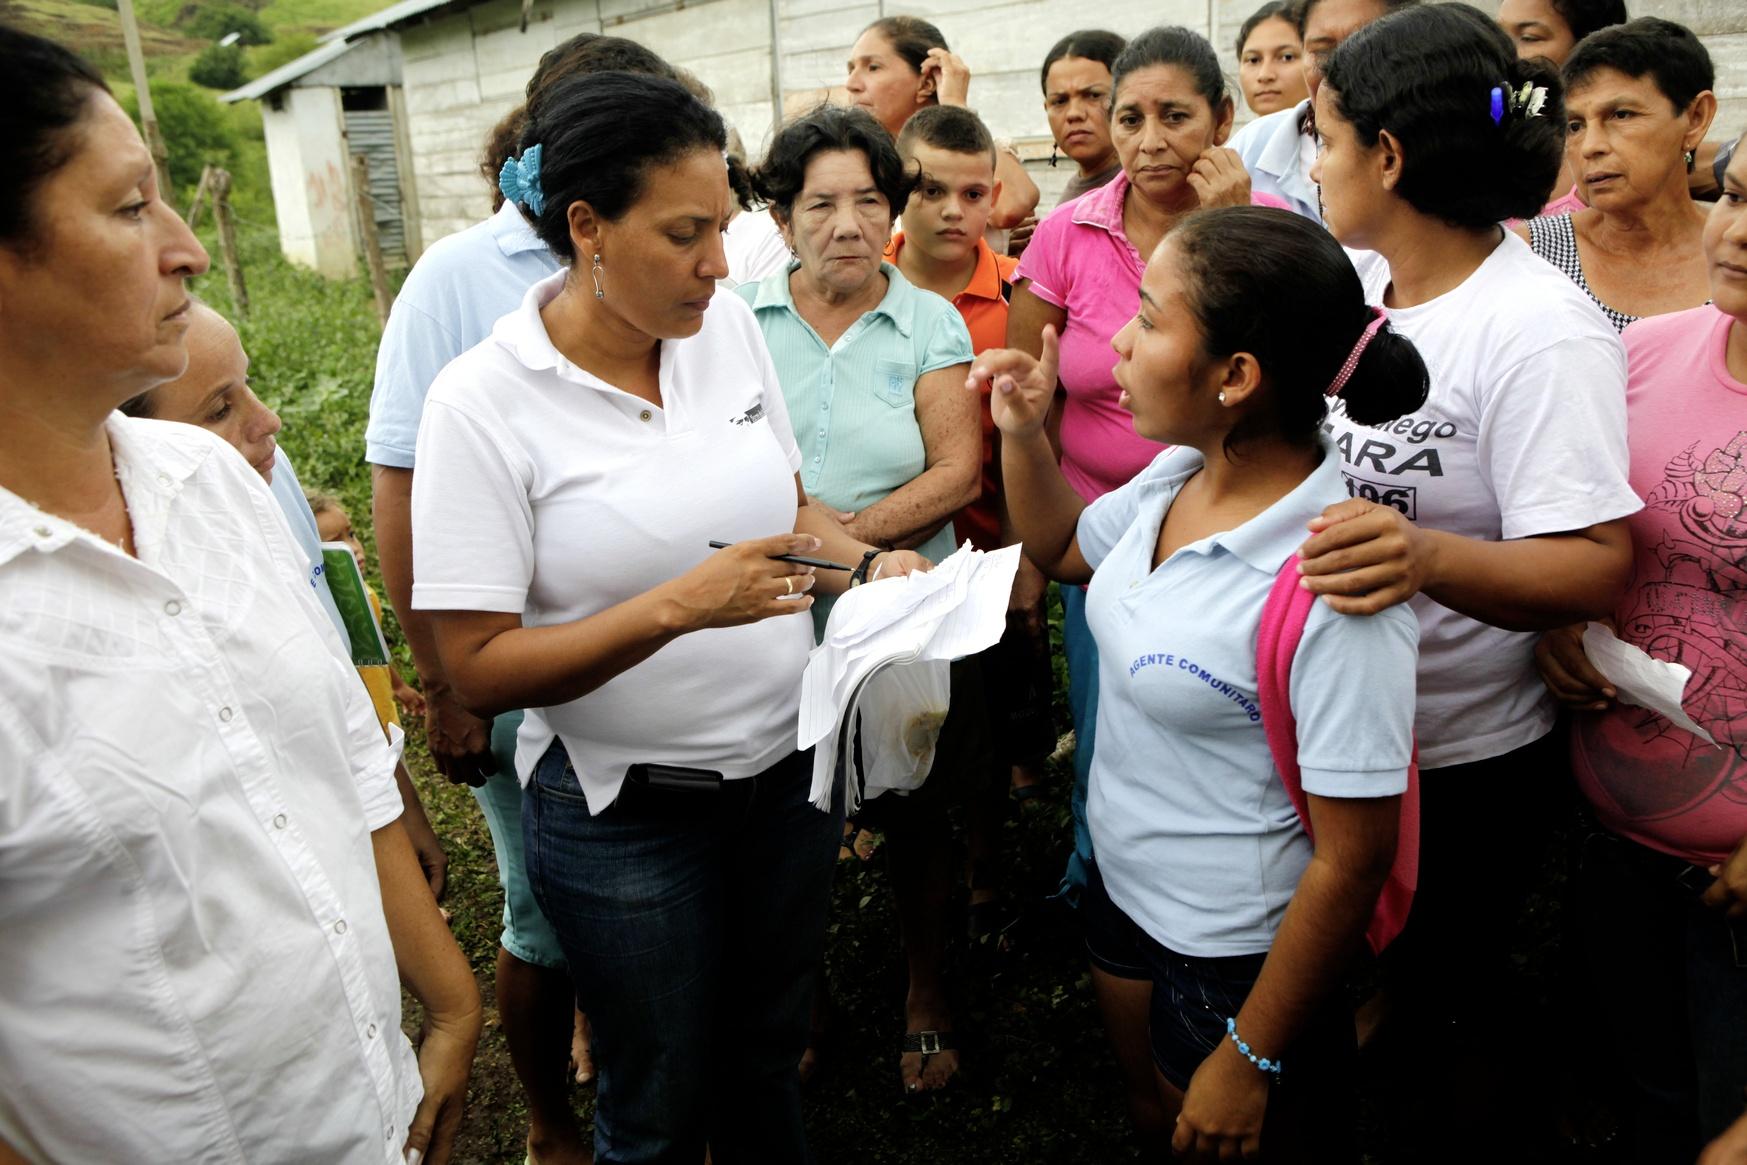 colombia_san-juan_displaced-people_odile-meylan_87_Web_98271